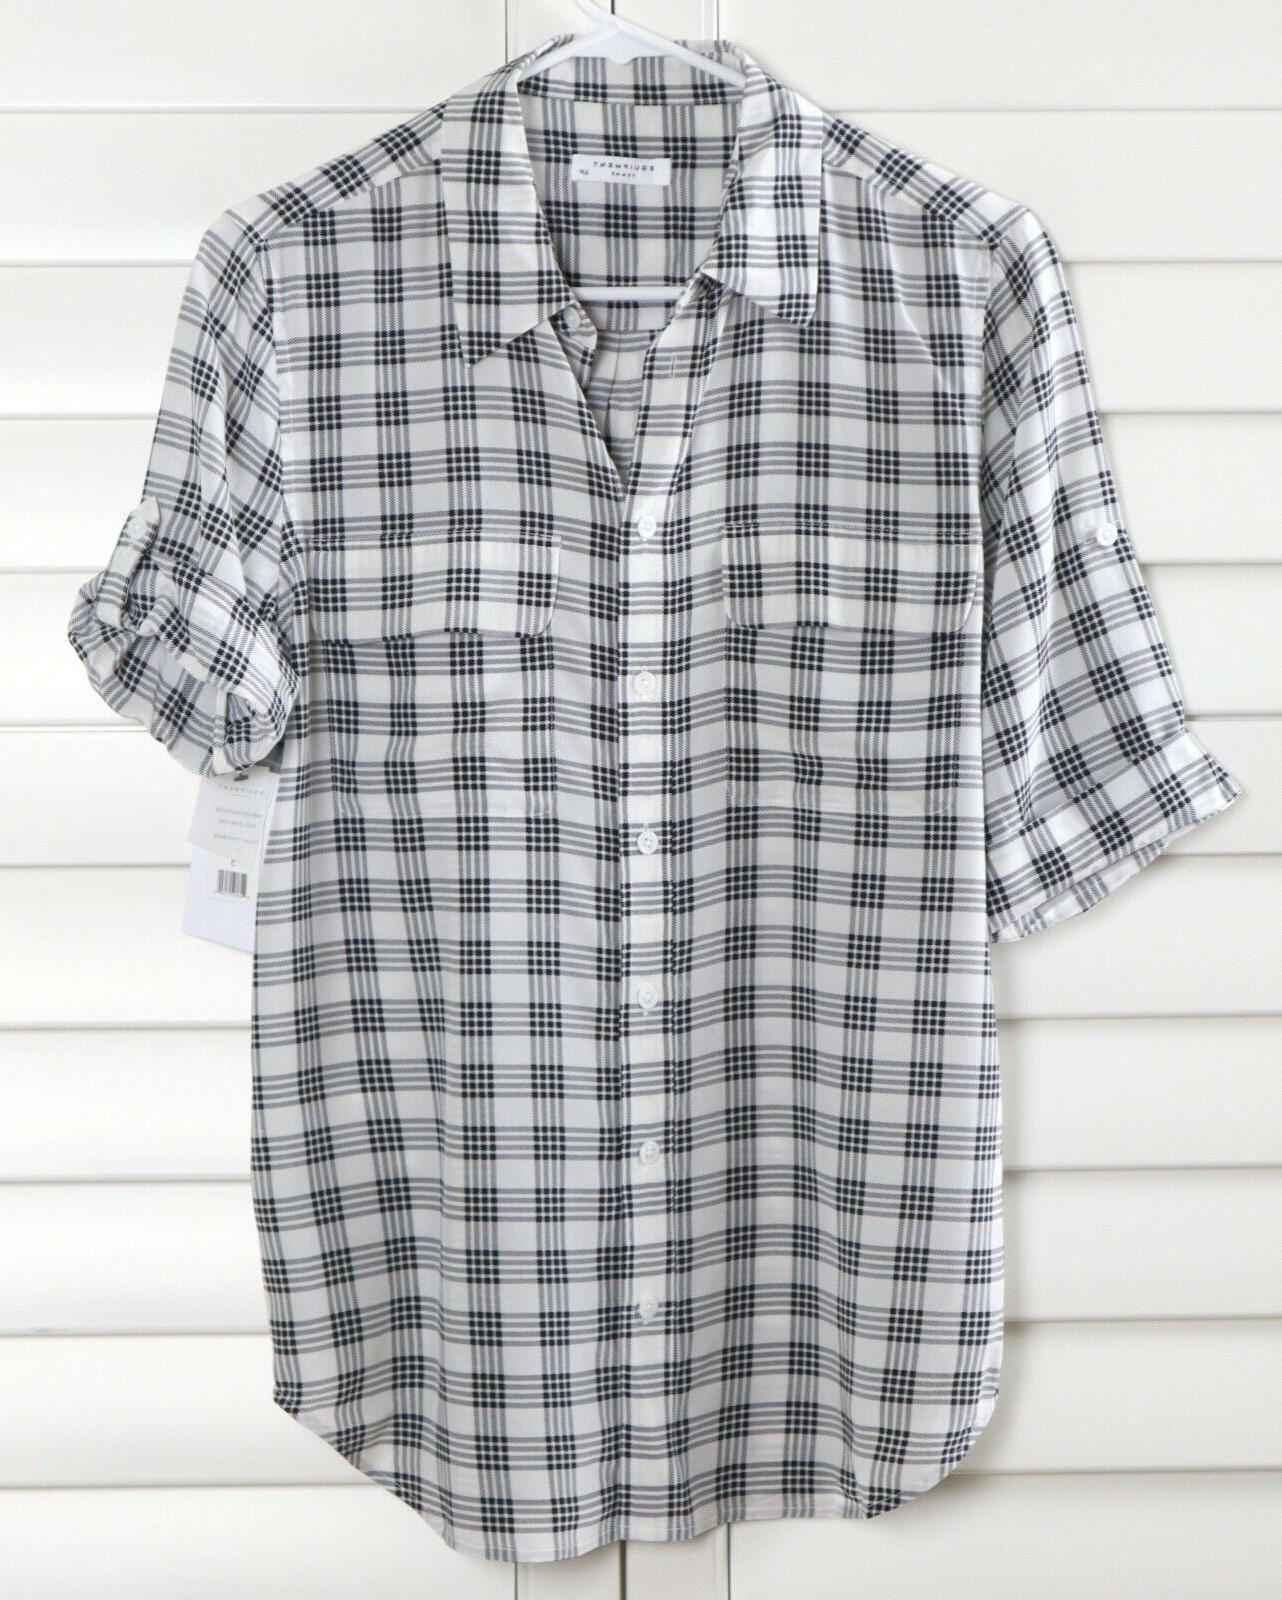 EQUIPMENT Femme Slim Signature Plaid Shirt Top Small